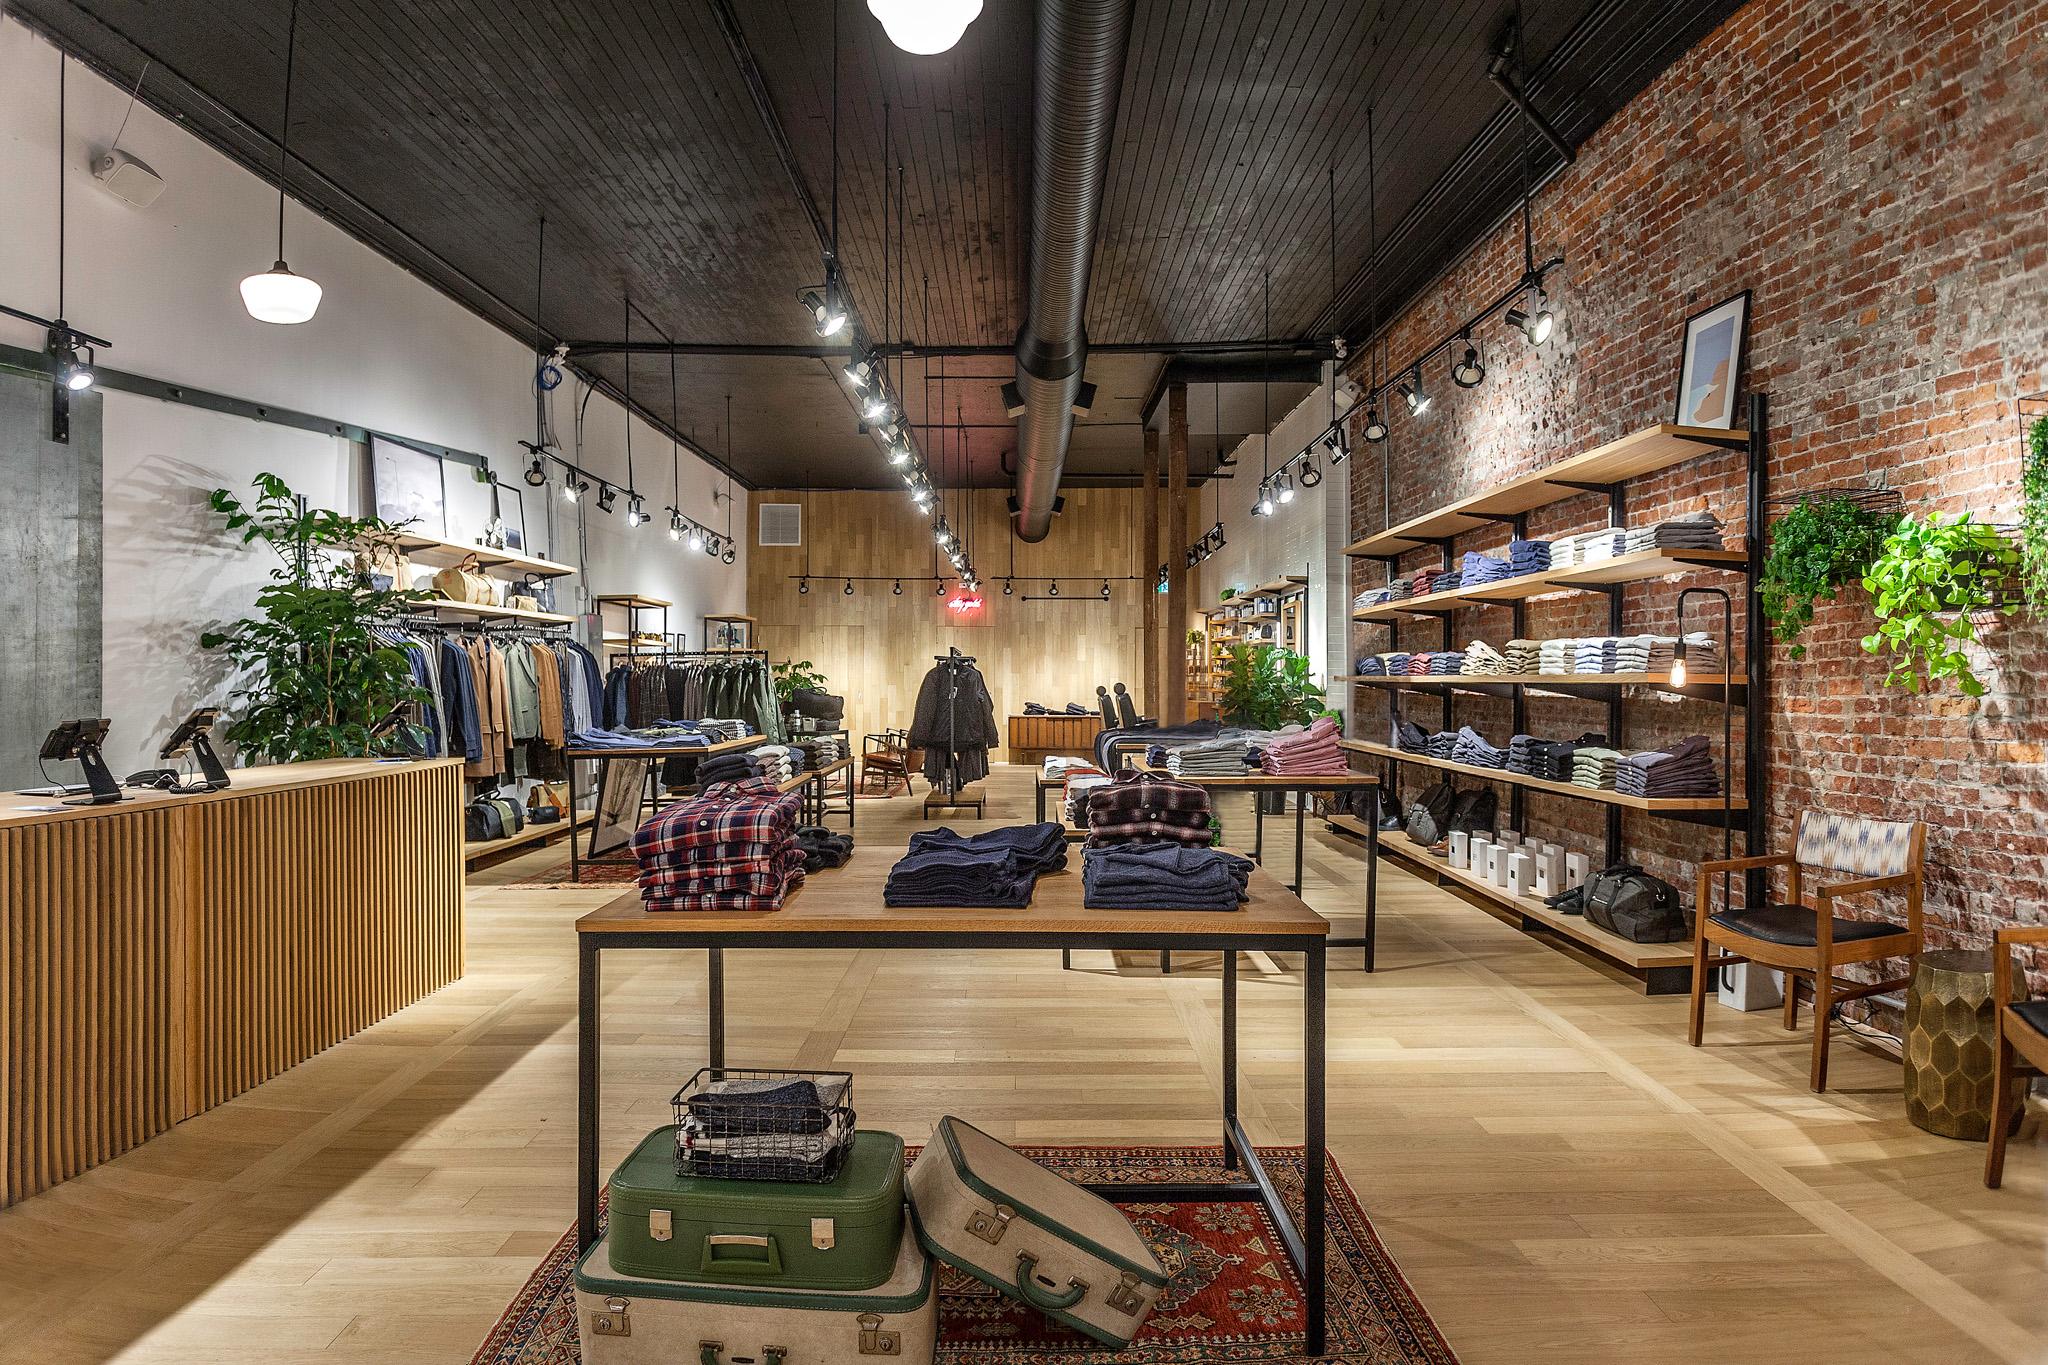 Man Cave Store Winnipeg : Eco.lux.luv